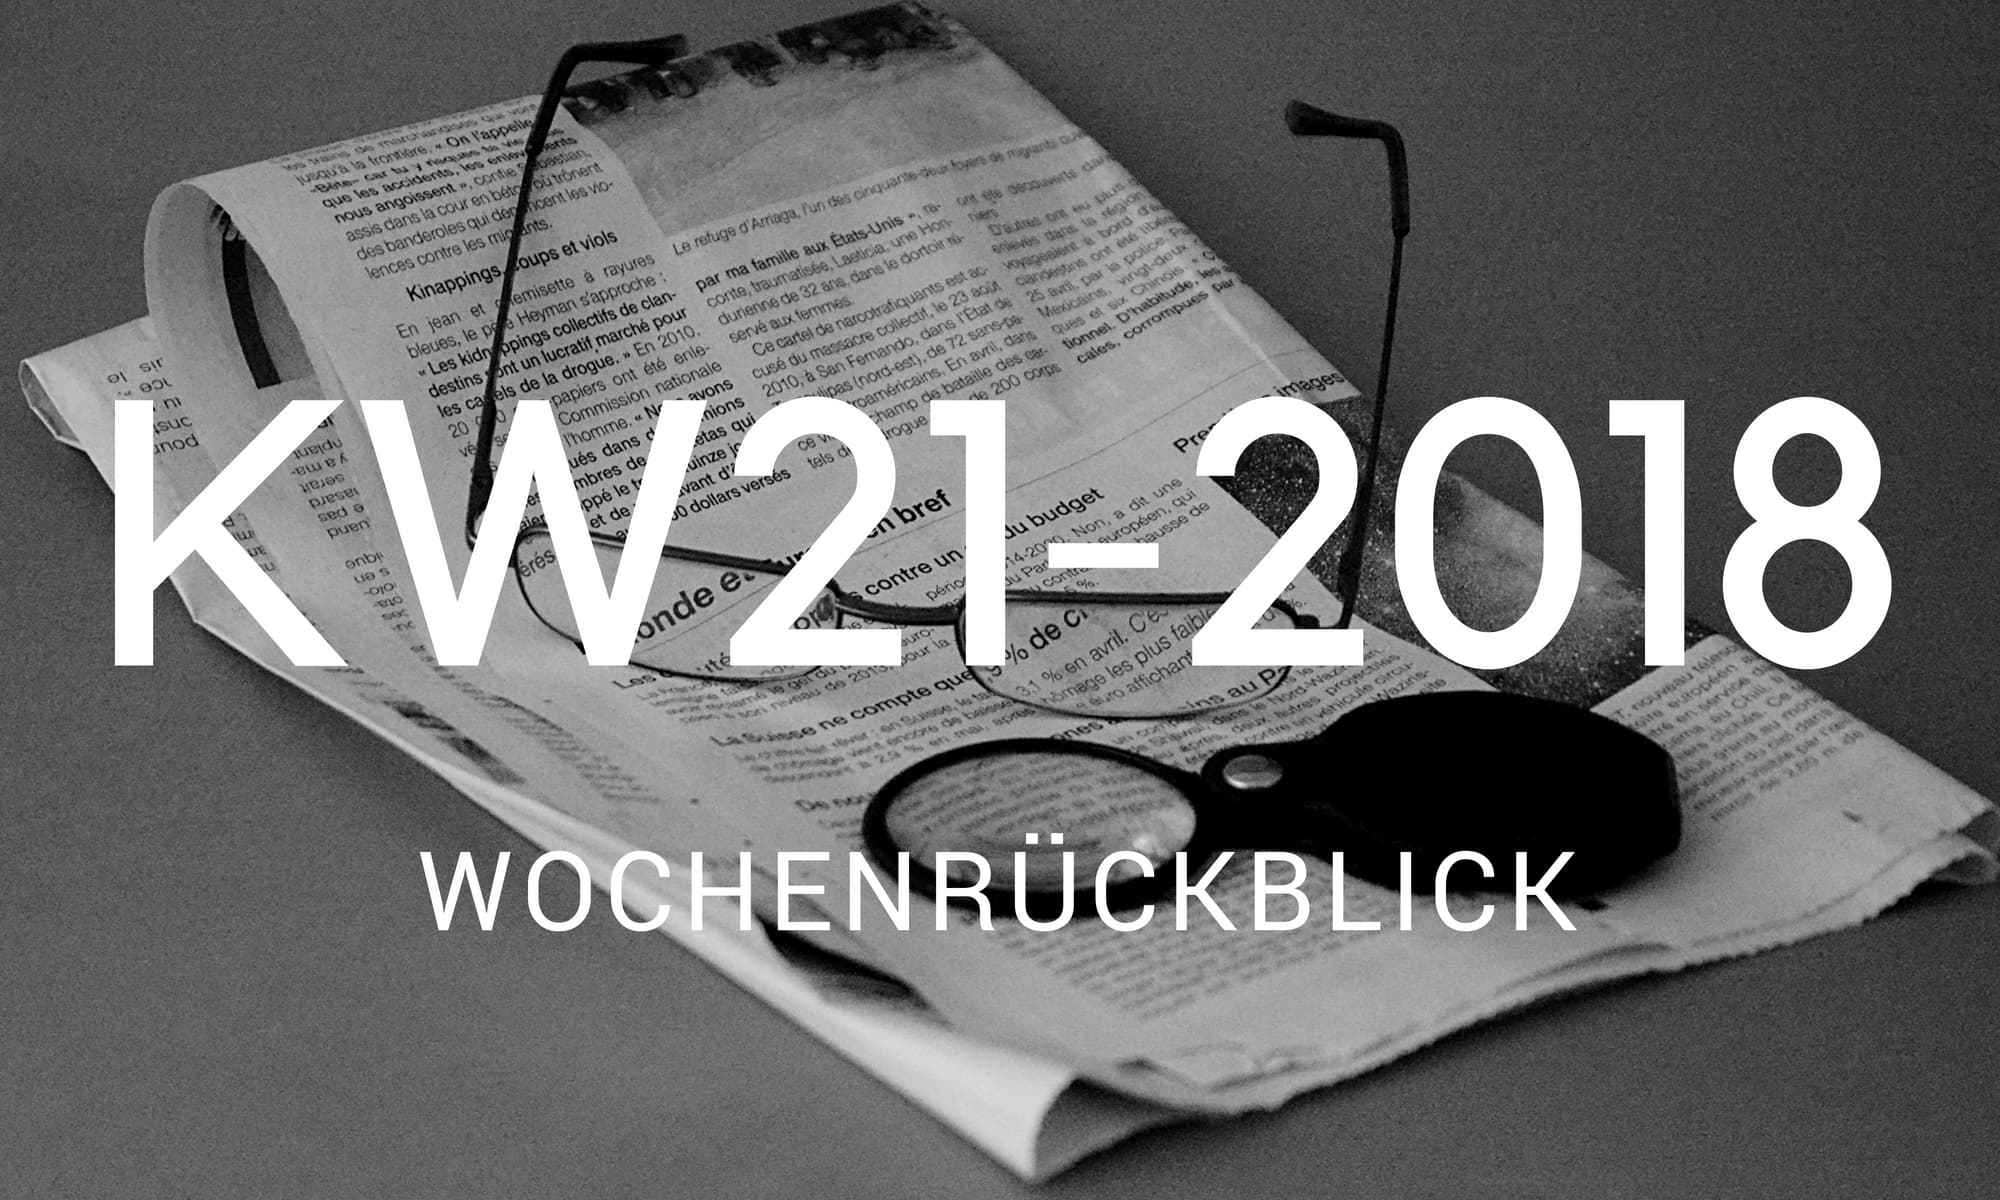 wochenrueckblick camping news KW21 2018